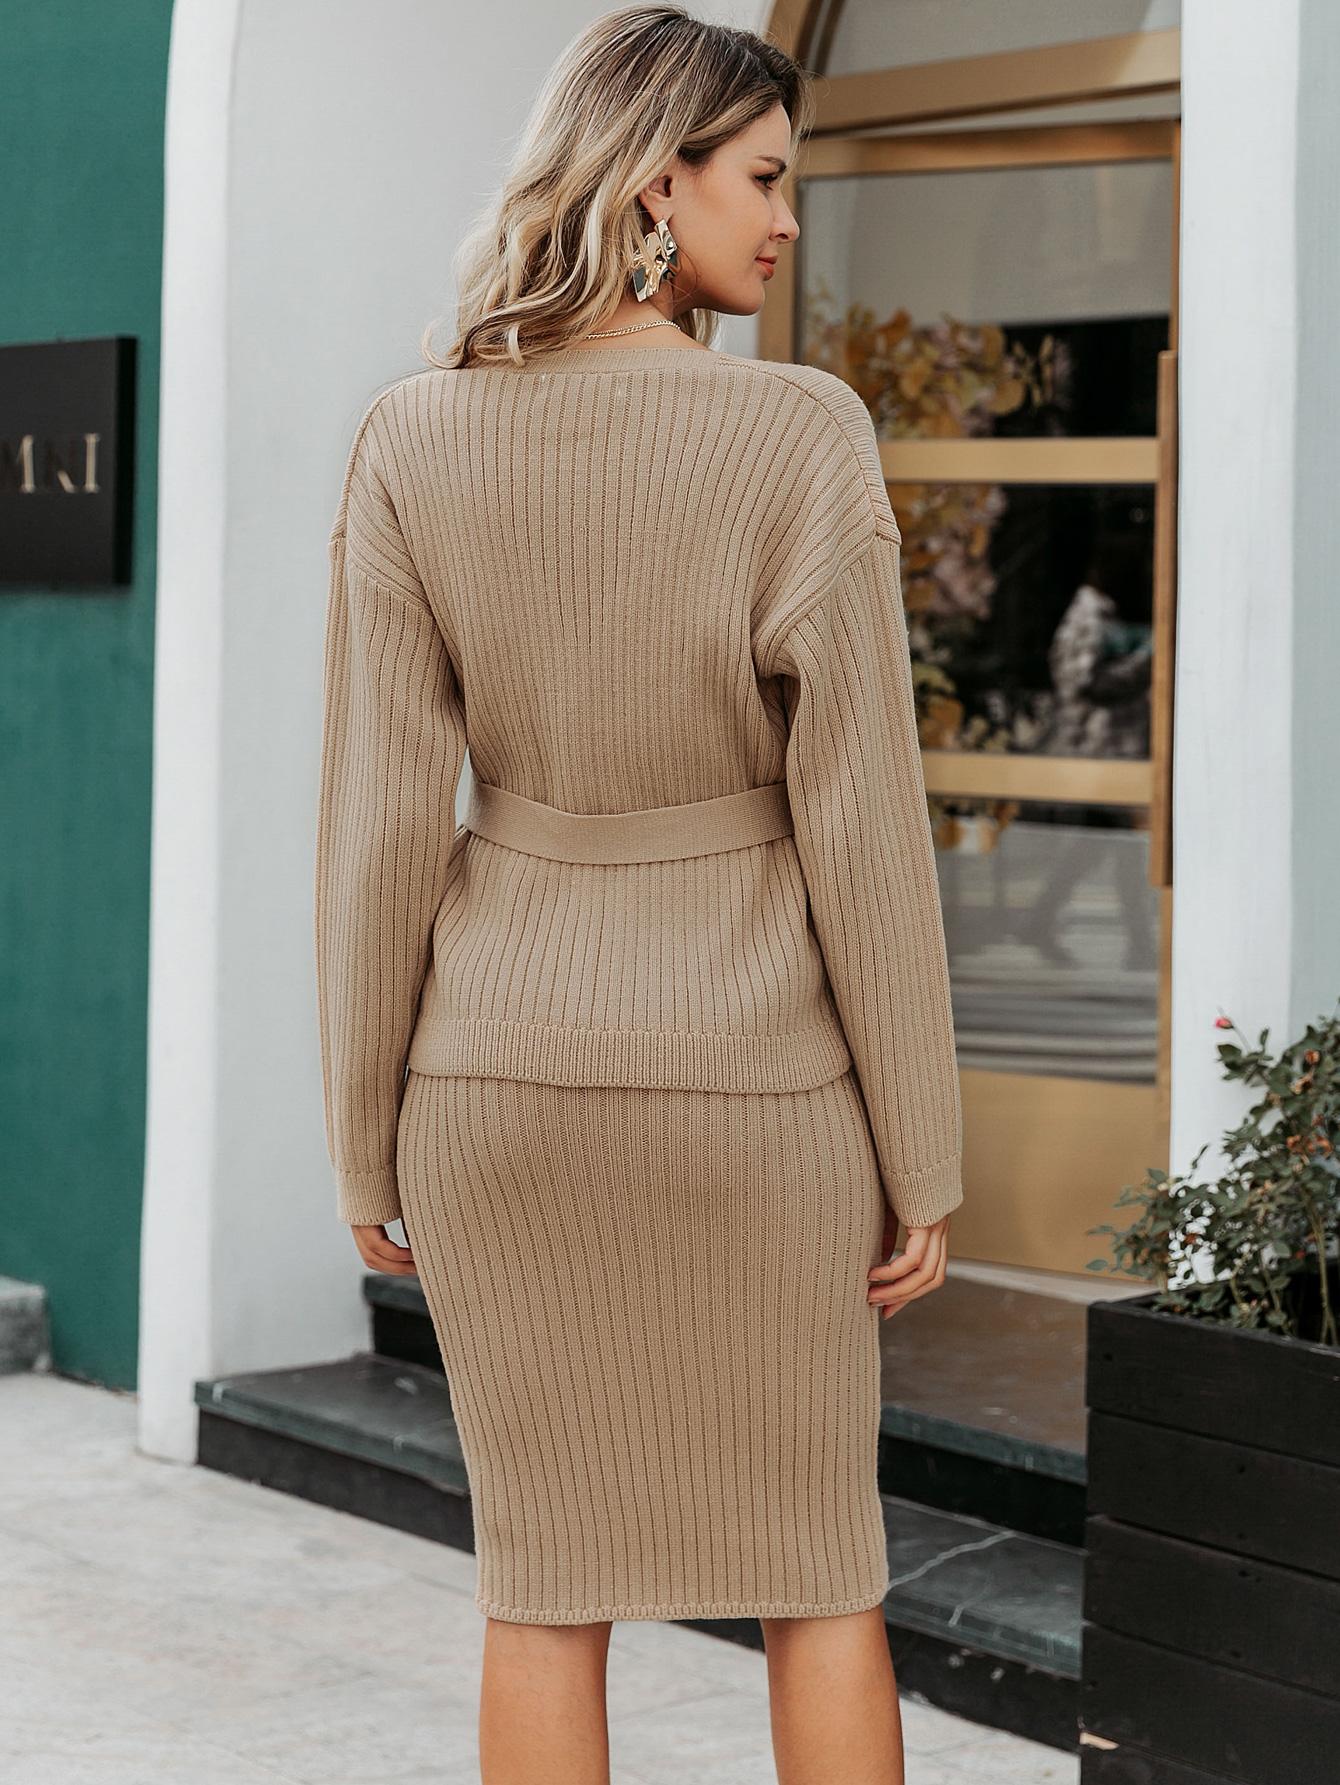 2019 new button skirt fashion women's wholesale NHDE190245